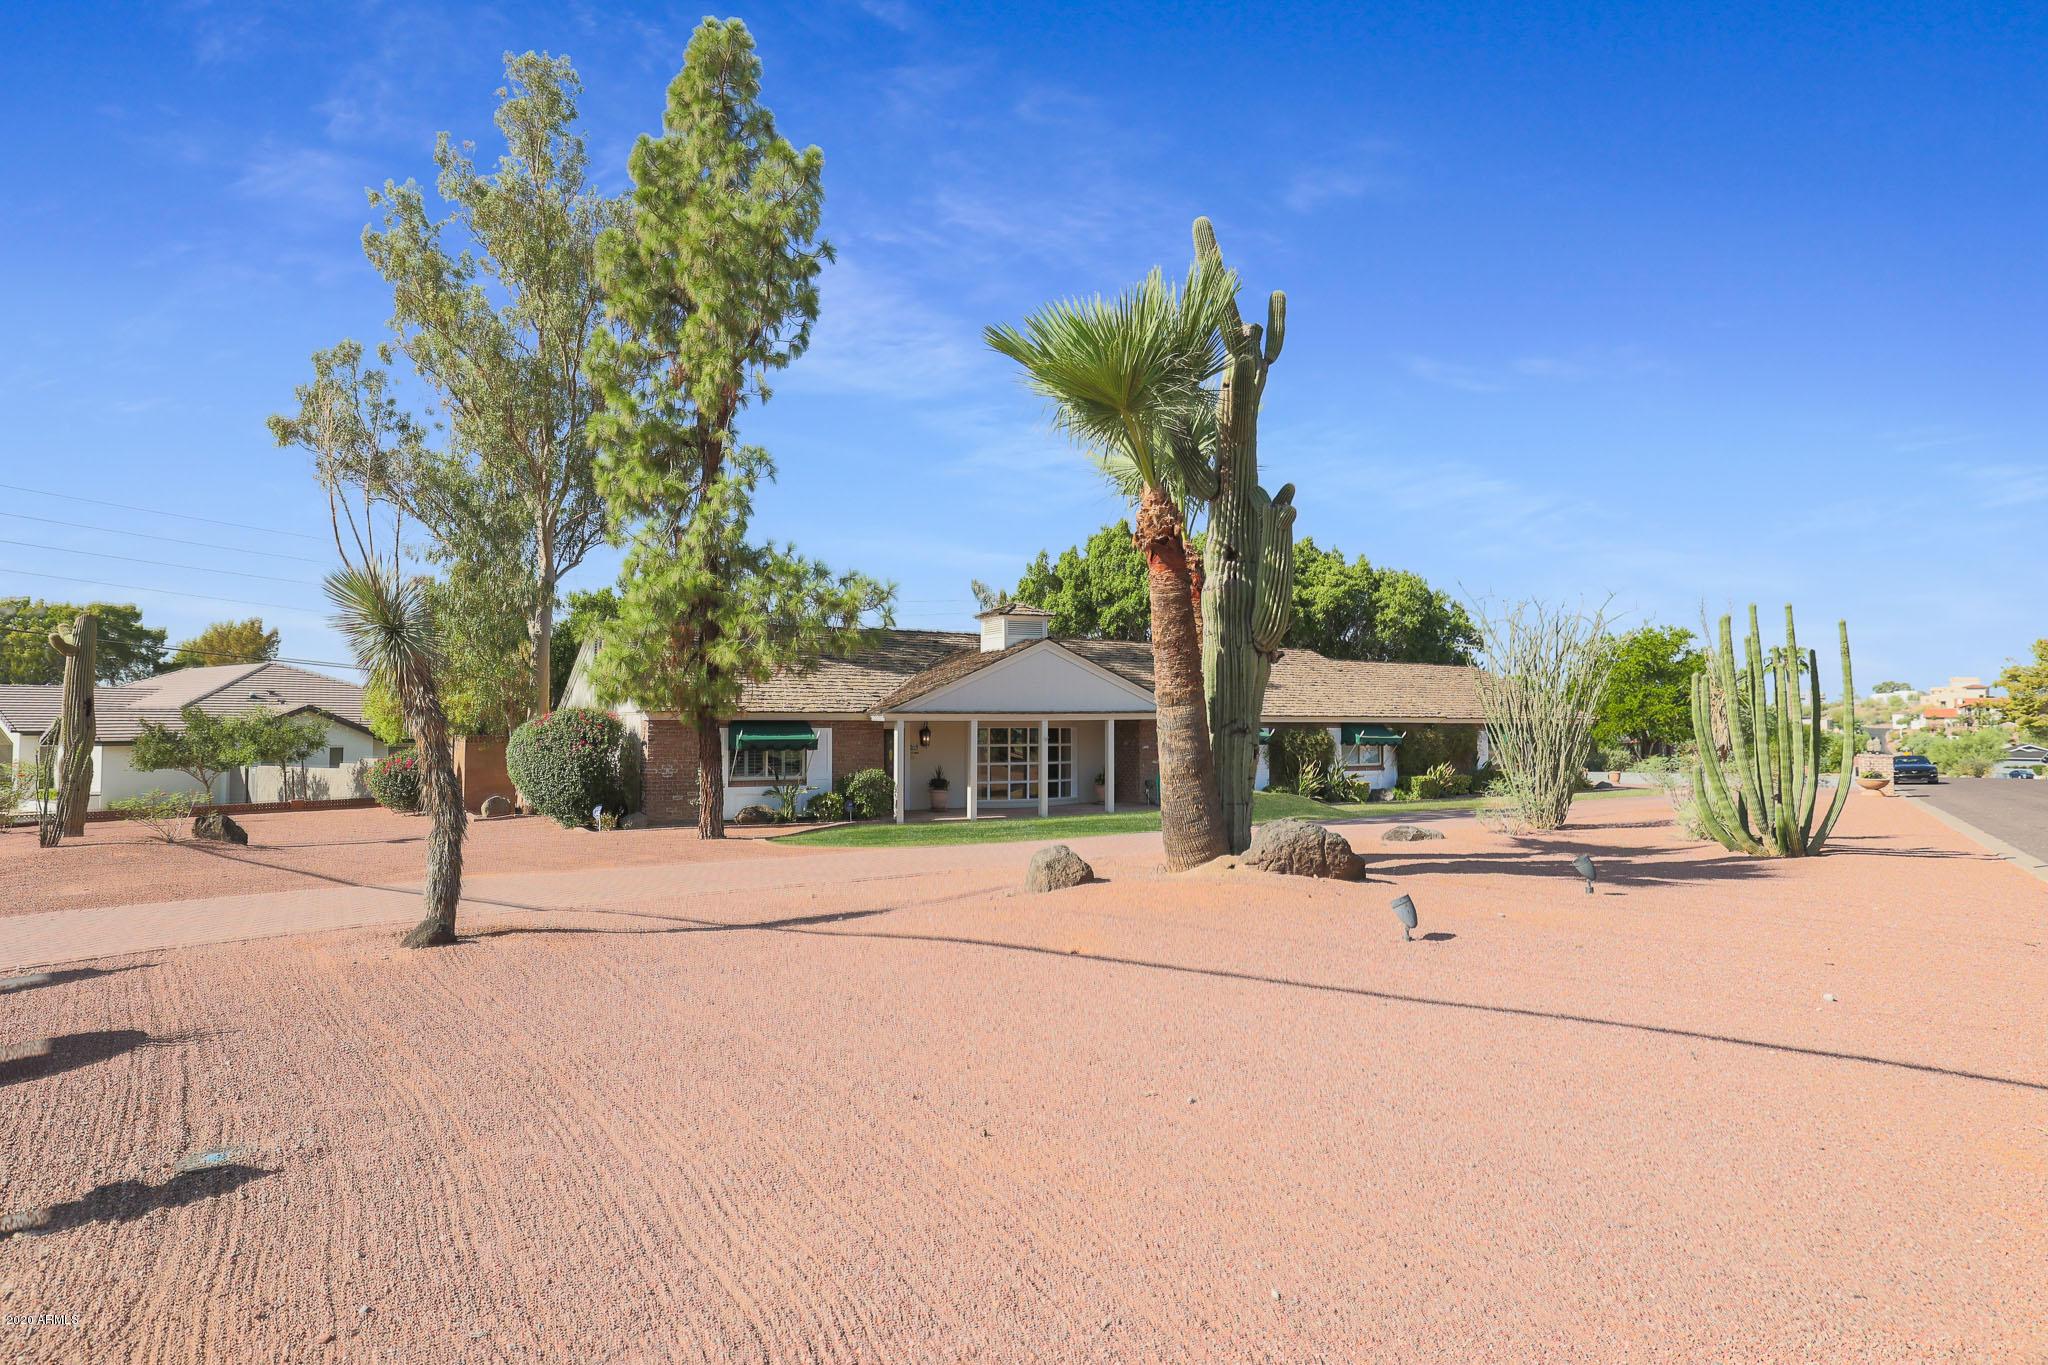 2333 BETHANY HOME Road, Phoenix, Arizona 85016, 4 Bedrooms Bedrooms, ,3 BathroomsBathrooms,Residential,For Sale,BETHANY HOME,6138109